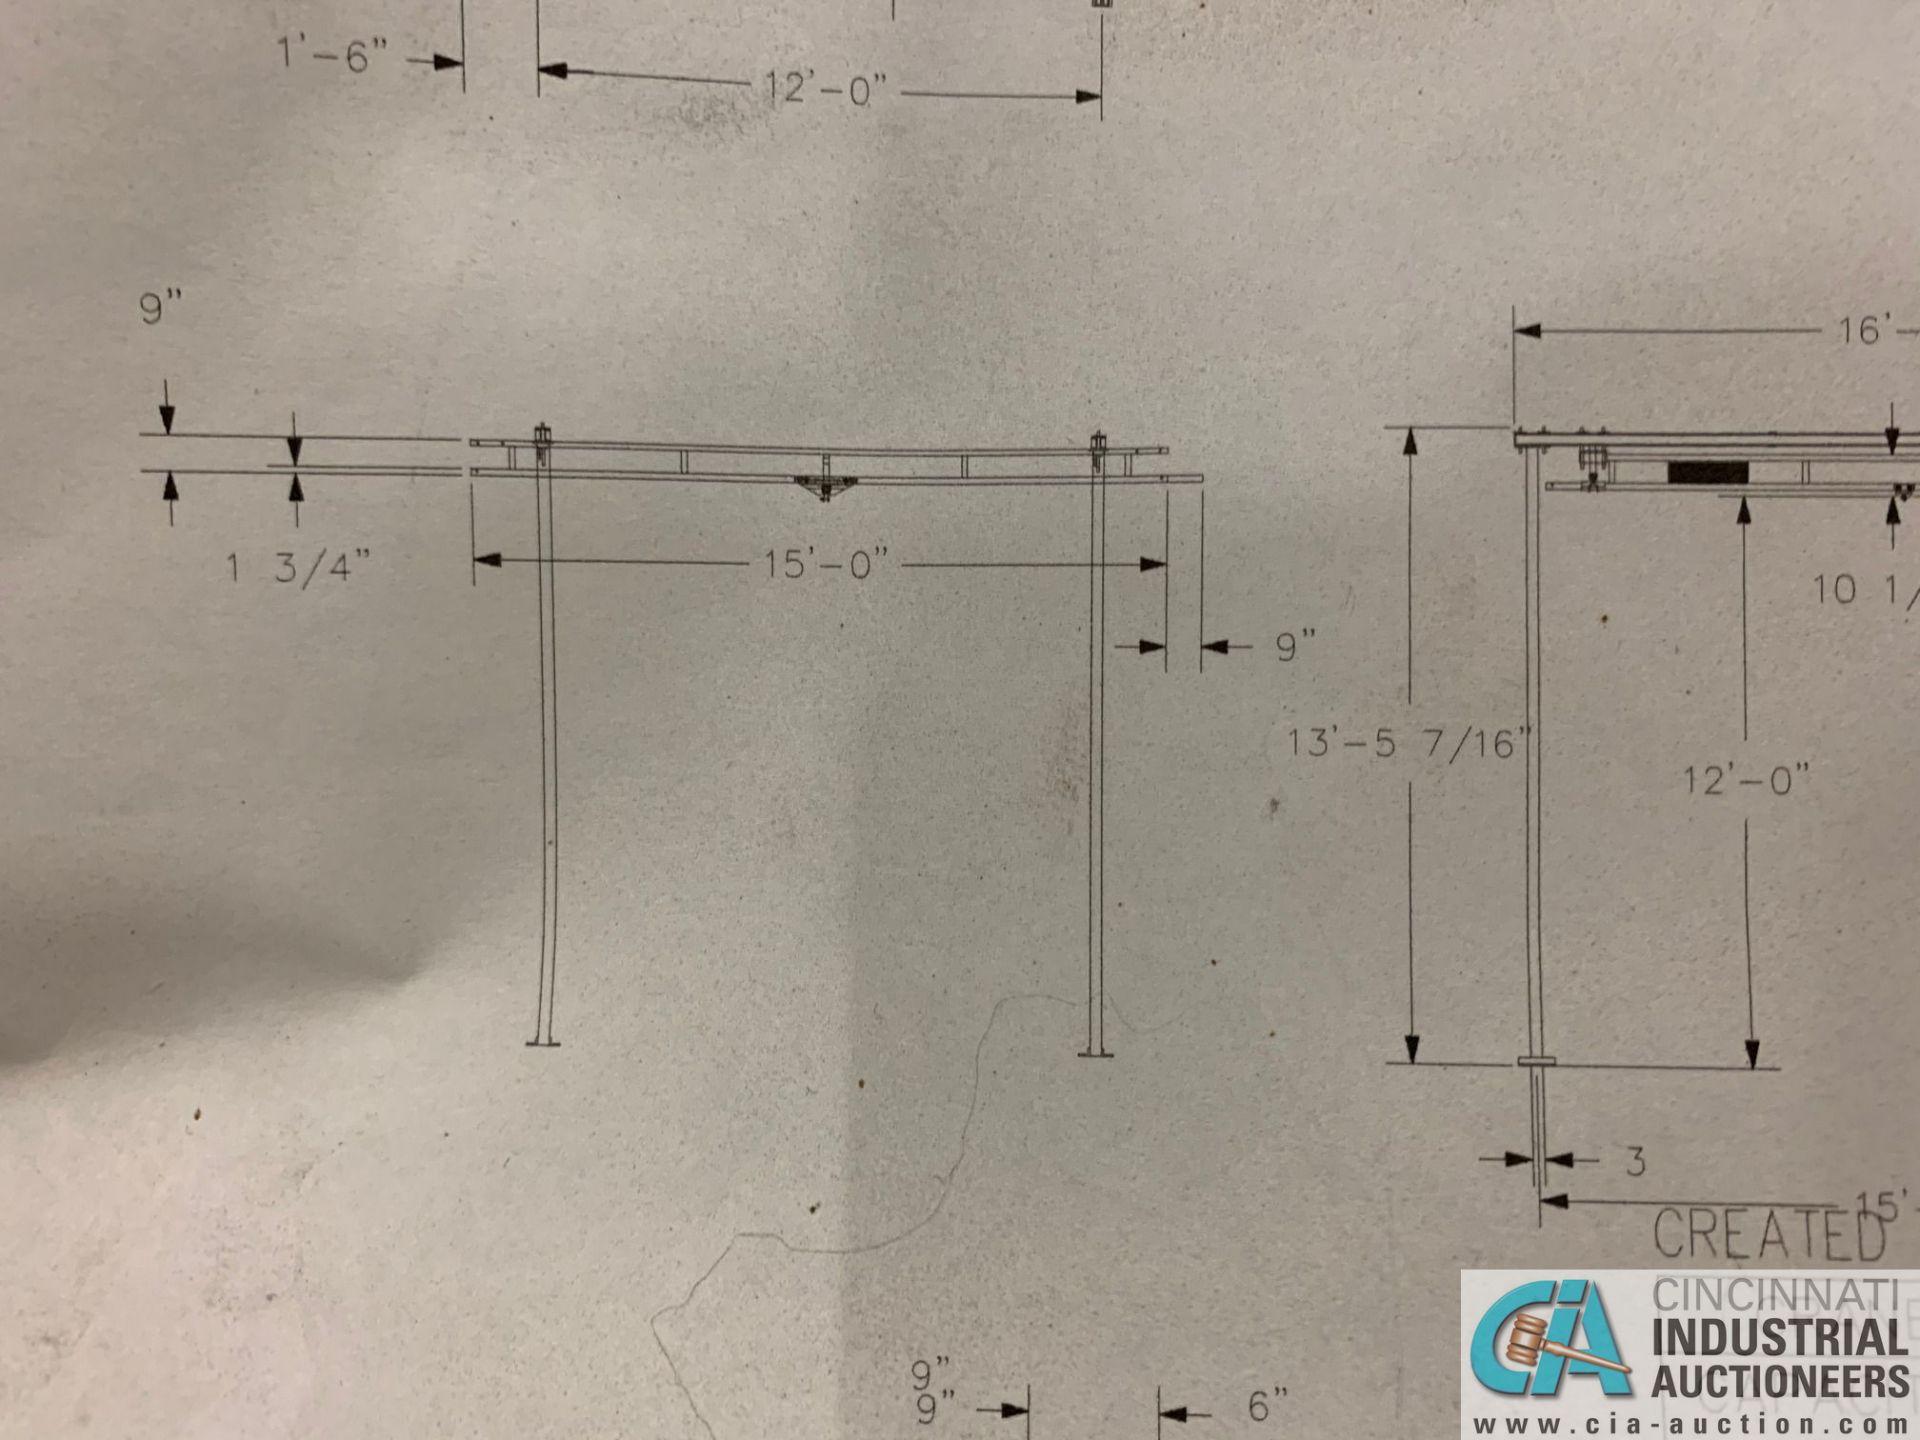 200 LB. GORBEL MODEL GLCS-FS-250-15-15-12 FREE-STANDING CRANE SYSTEM; 15' BRIDGE OAL, 15' RUNWAY - Image 12 of 15